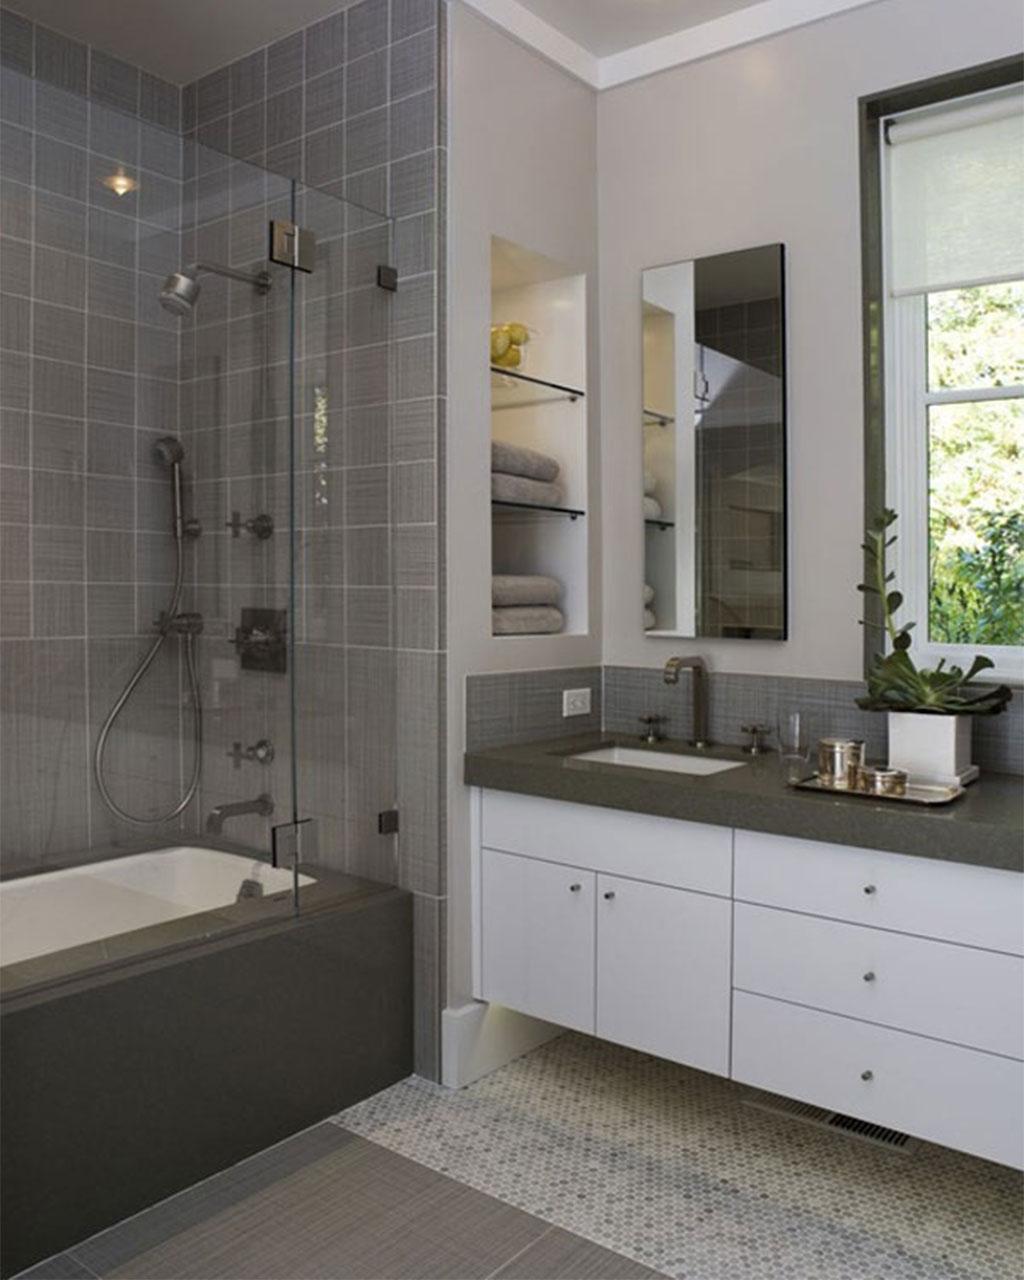 30 Best Small Bathroom Ideas on Small Space Small Bathroom Ideas With Shower id=35949